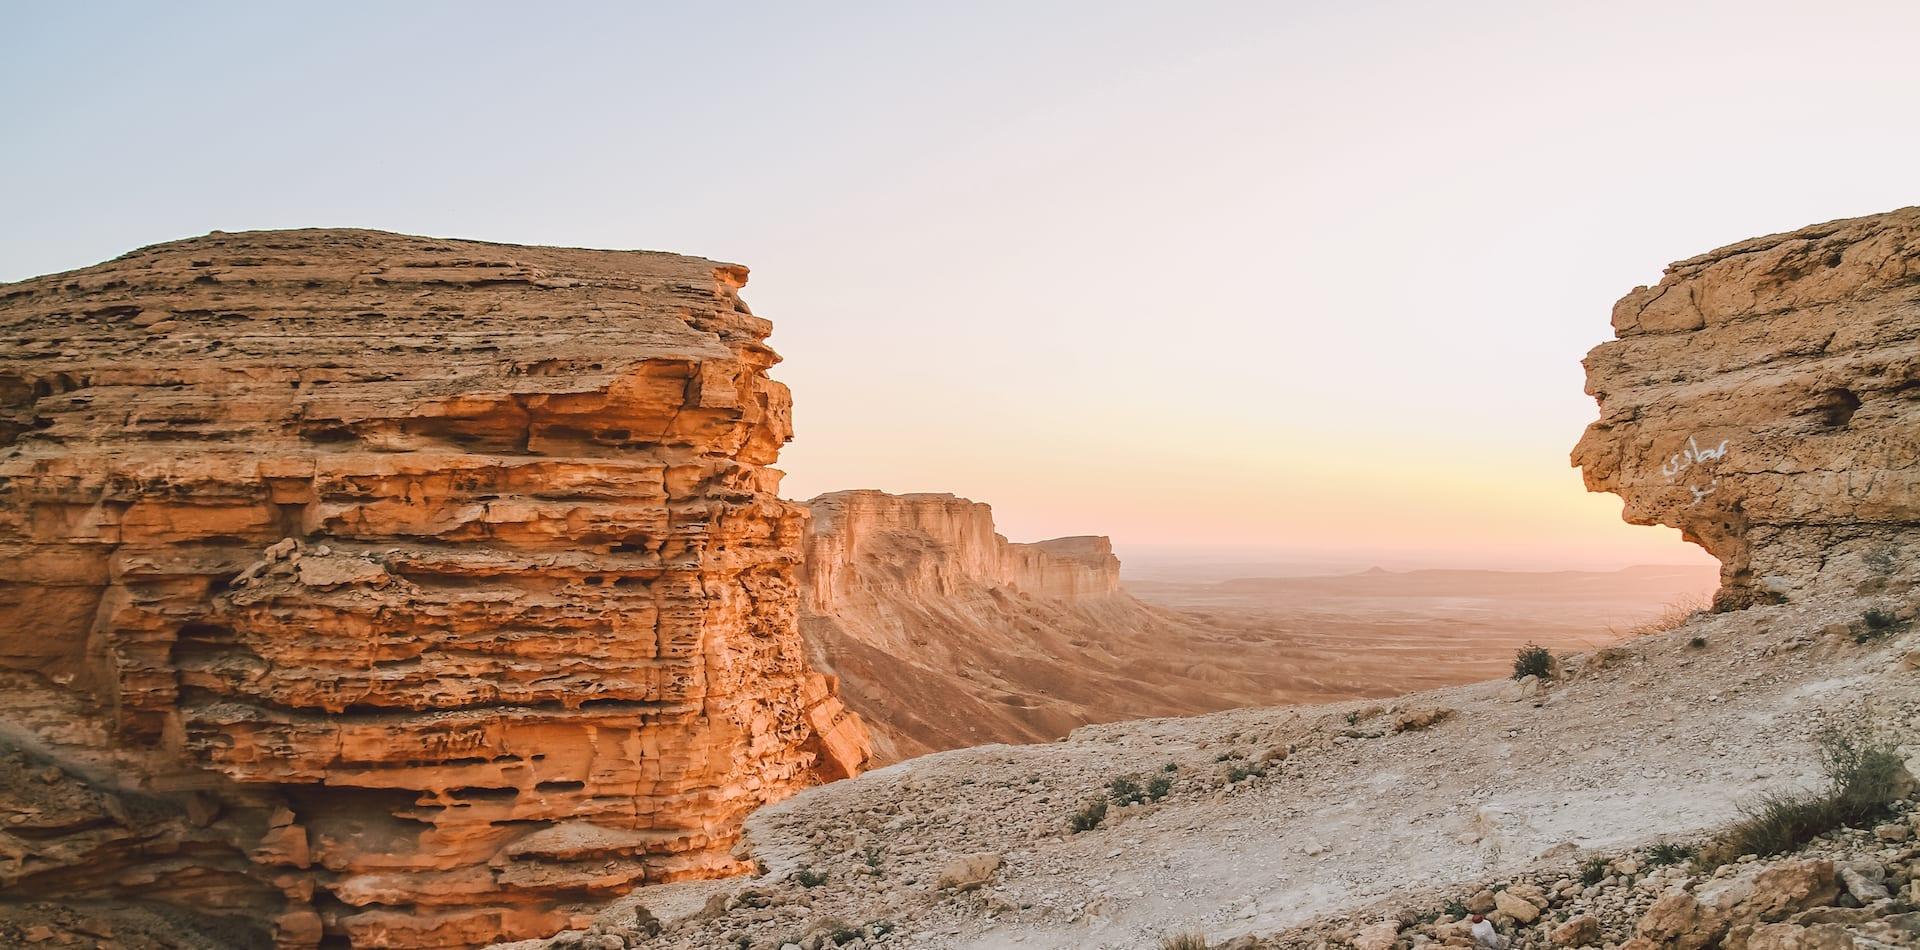 sunset falls upon Saudi's intricate rock formations